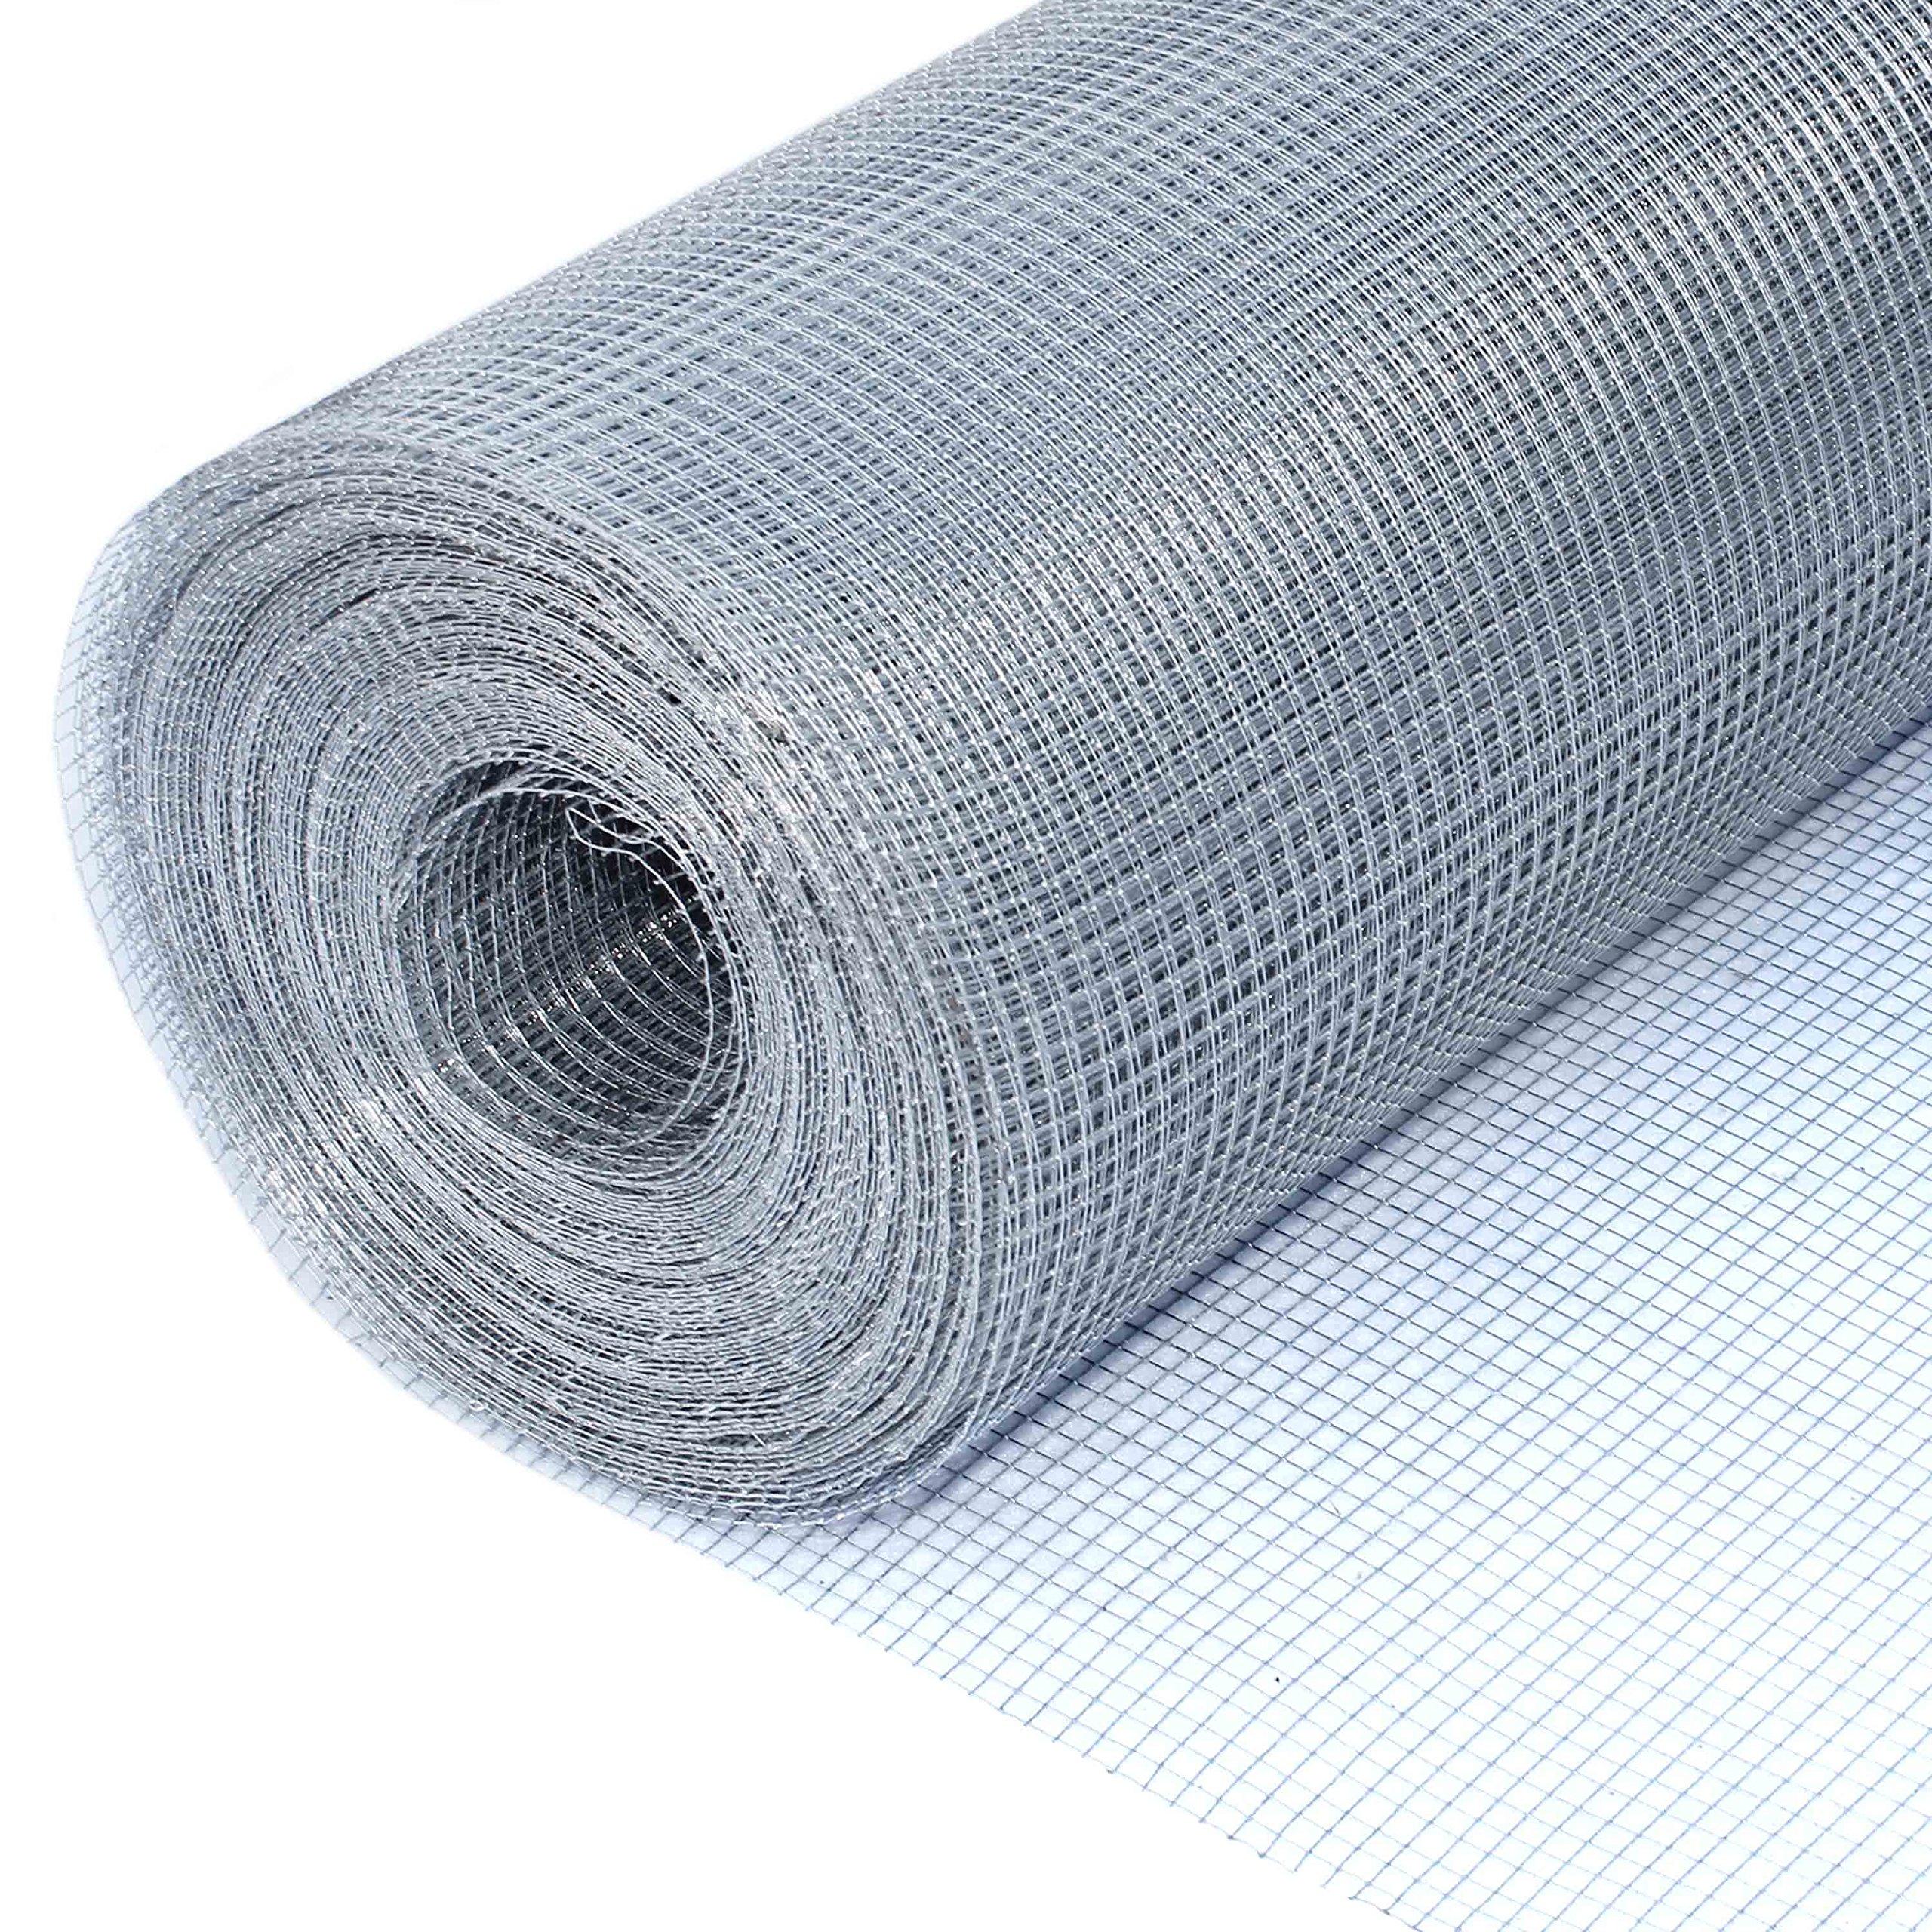 ALEKO Mesh Wire Roll Cloth 23 Gauge Steel 100 Feet Long 48 Inch Height 1/4 Inch Mesh